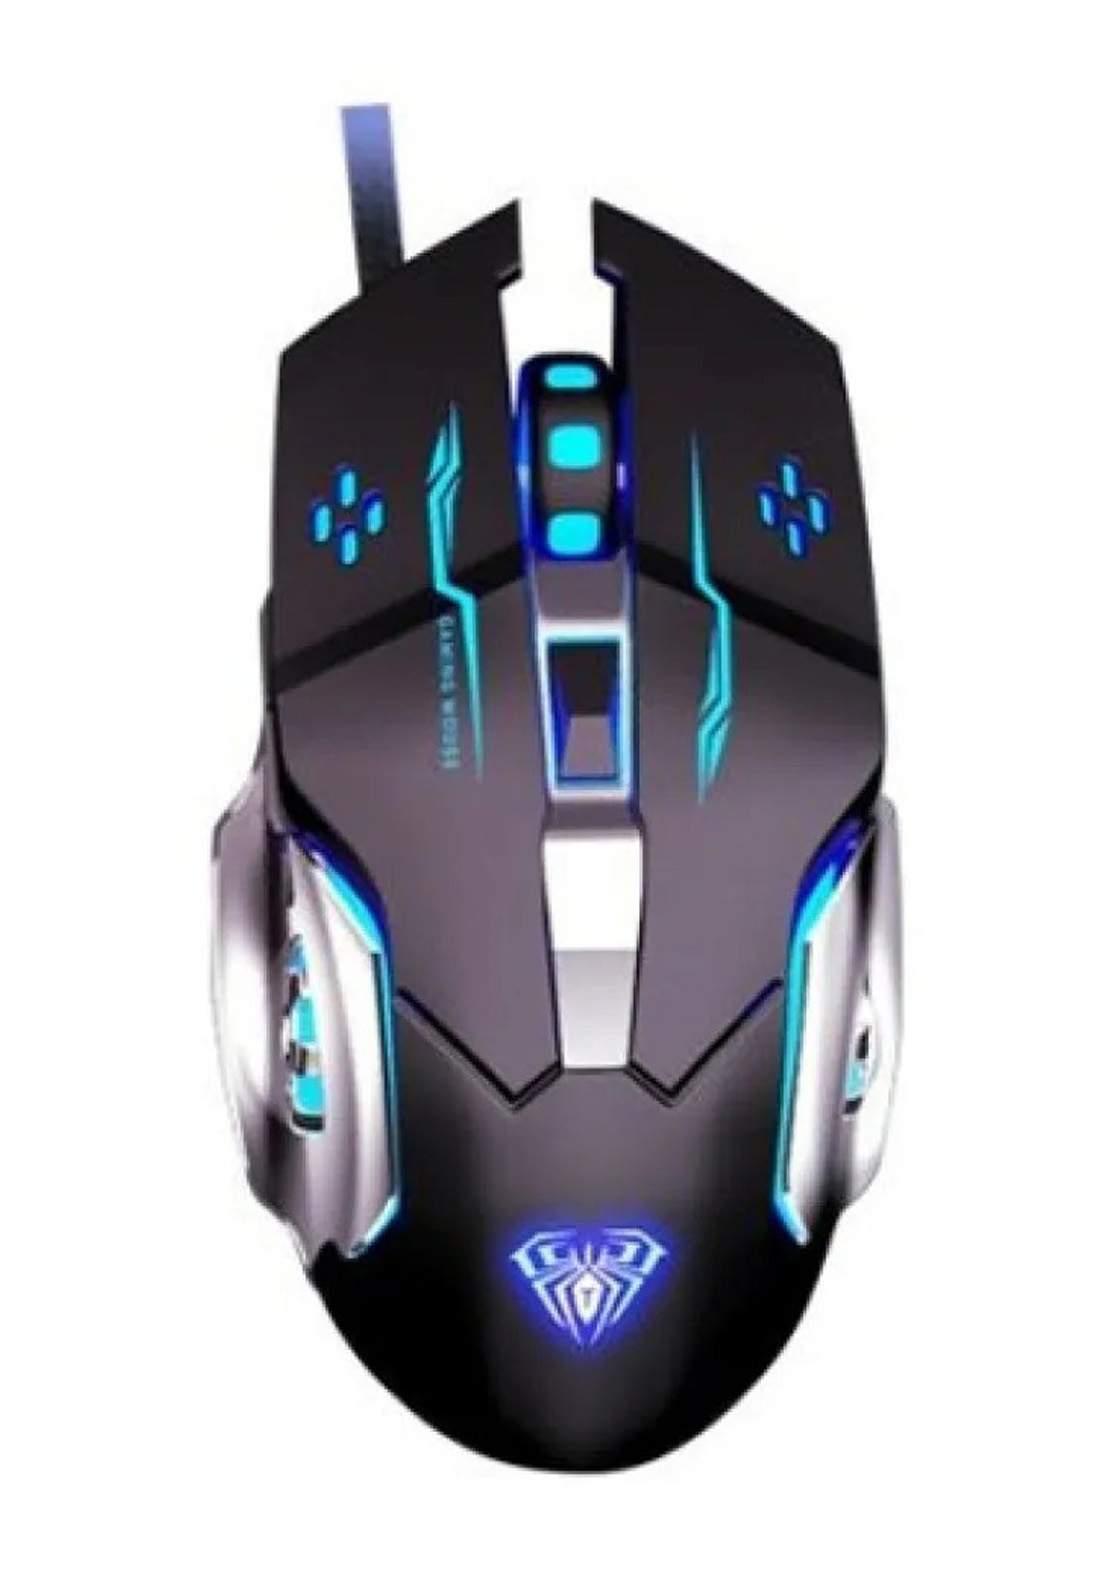 Aula S20 Programmable Ergonomic Optical Gaming Mouse - Black ماوس